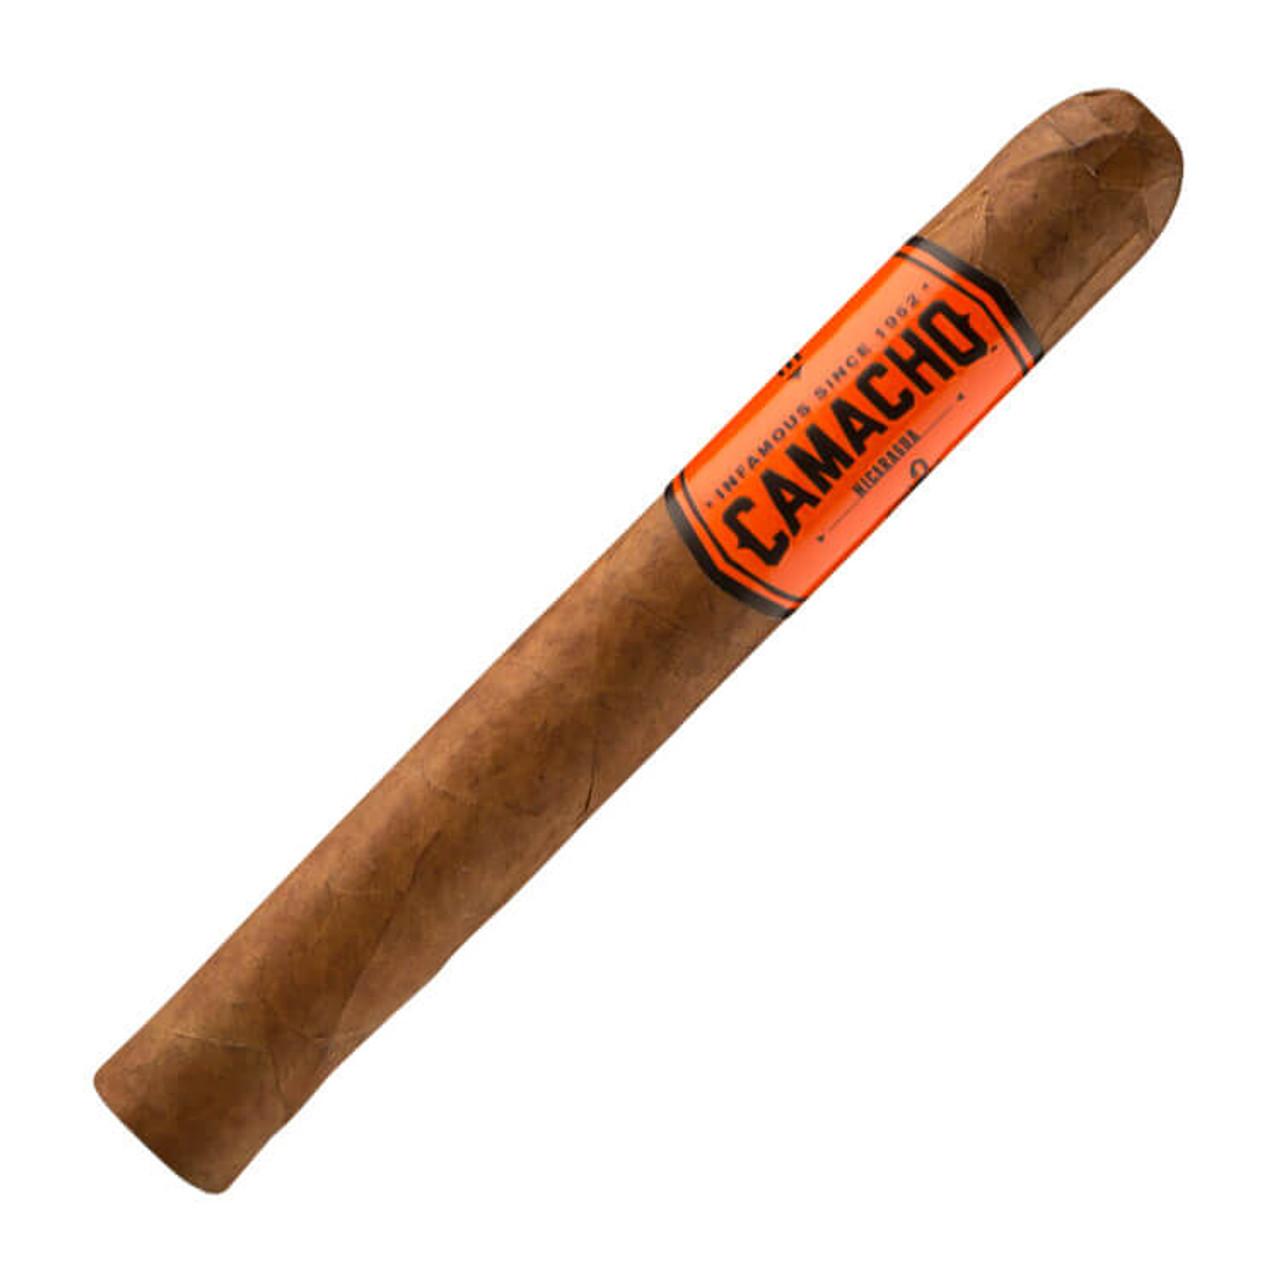 Camacho Nicaragua Churchill Cigars - 7.0 x 56 (Box of 20)